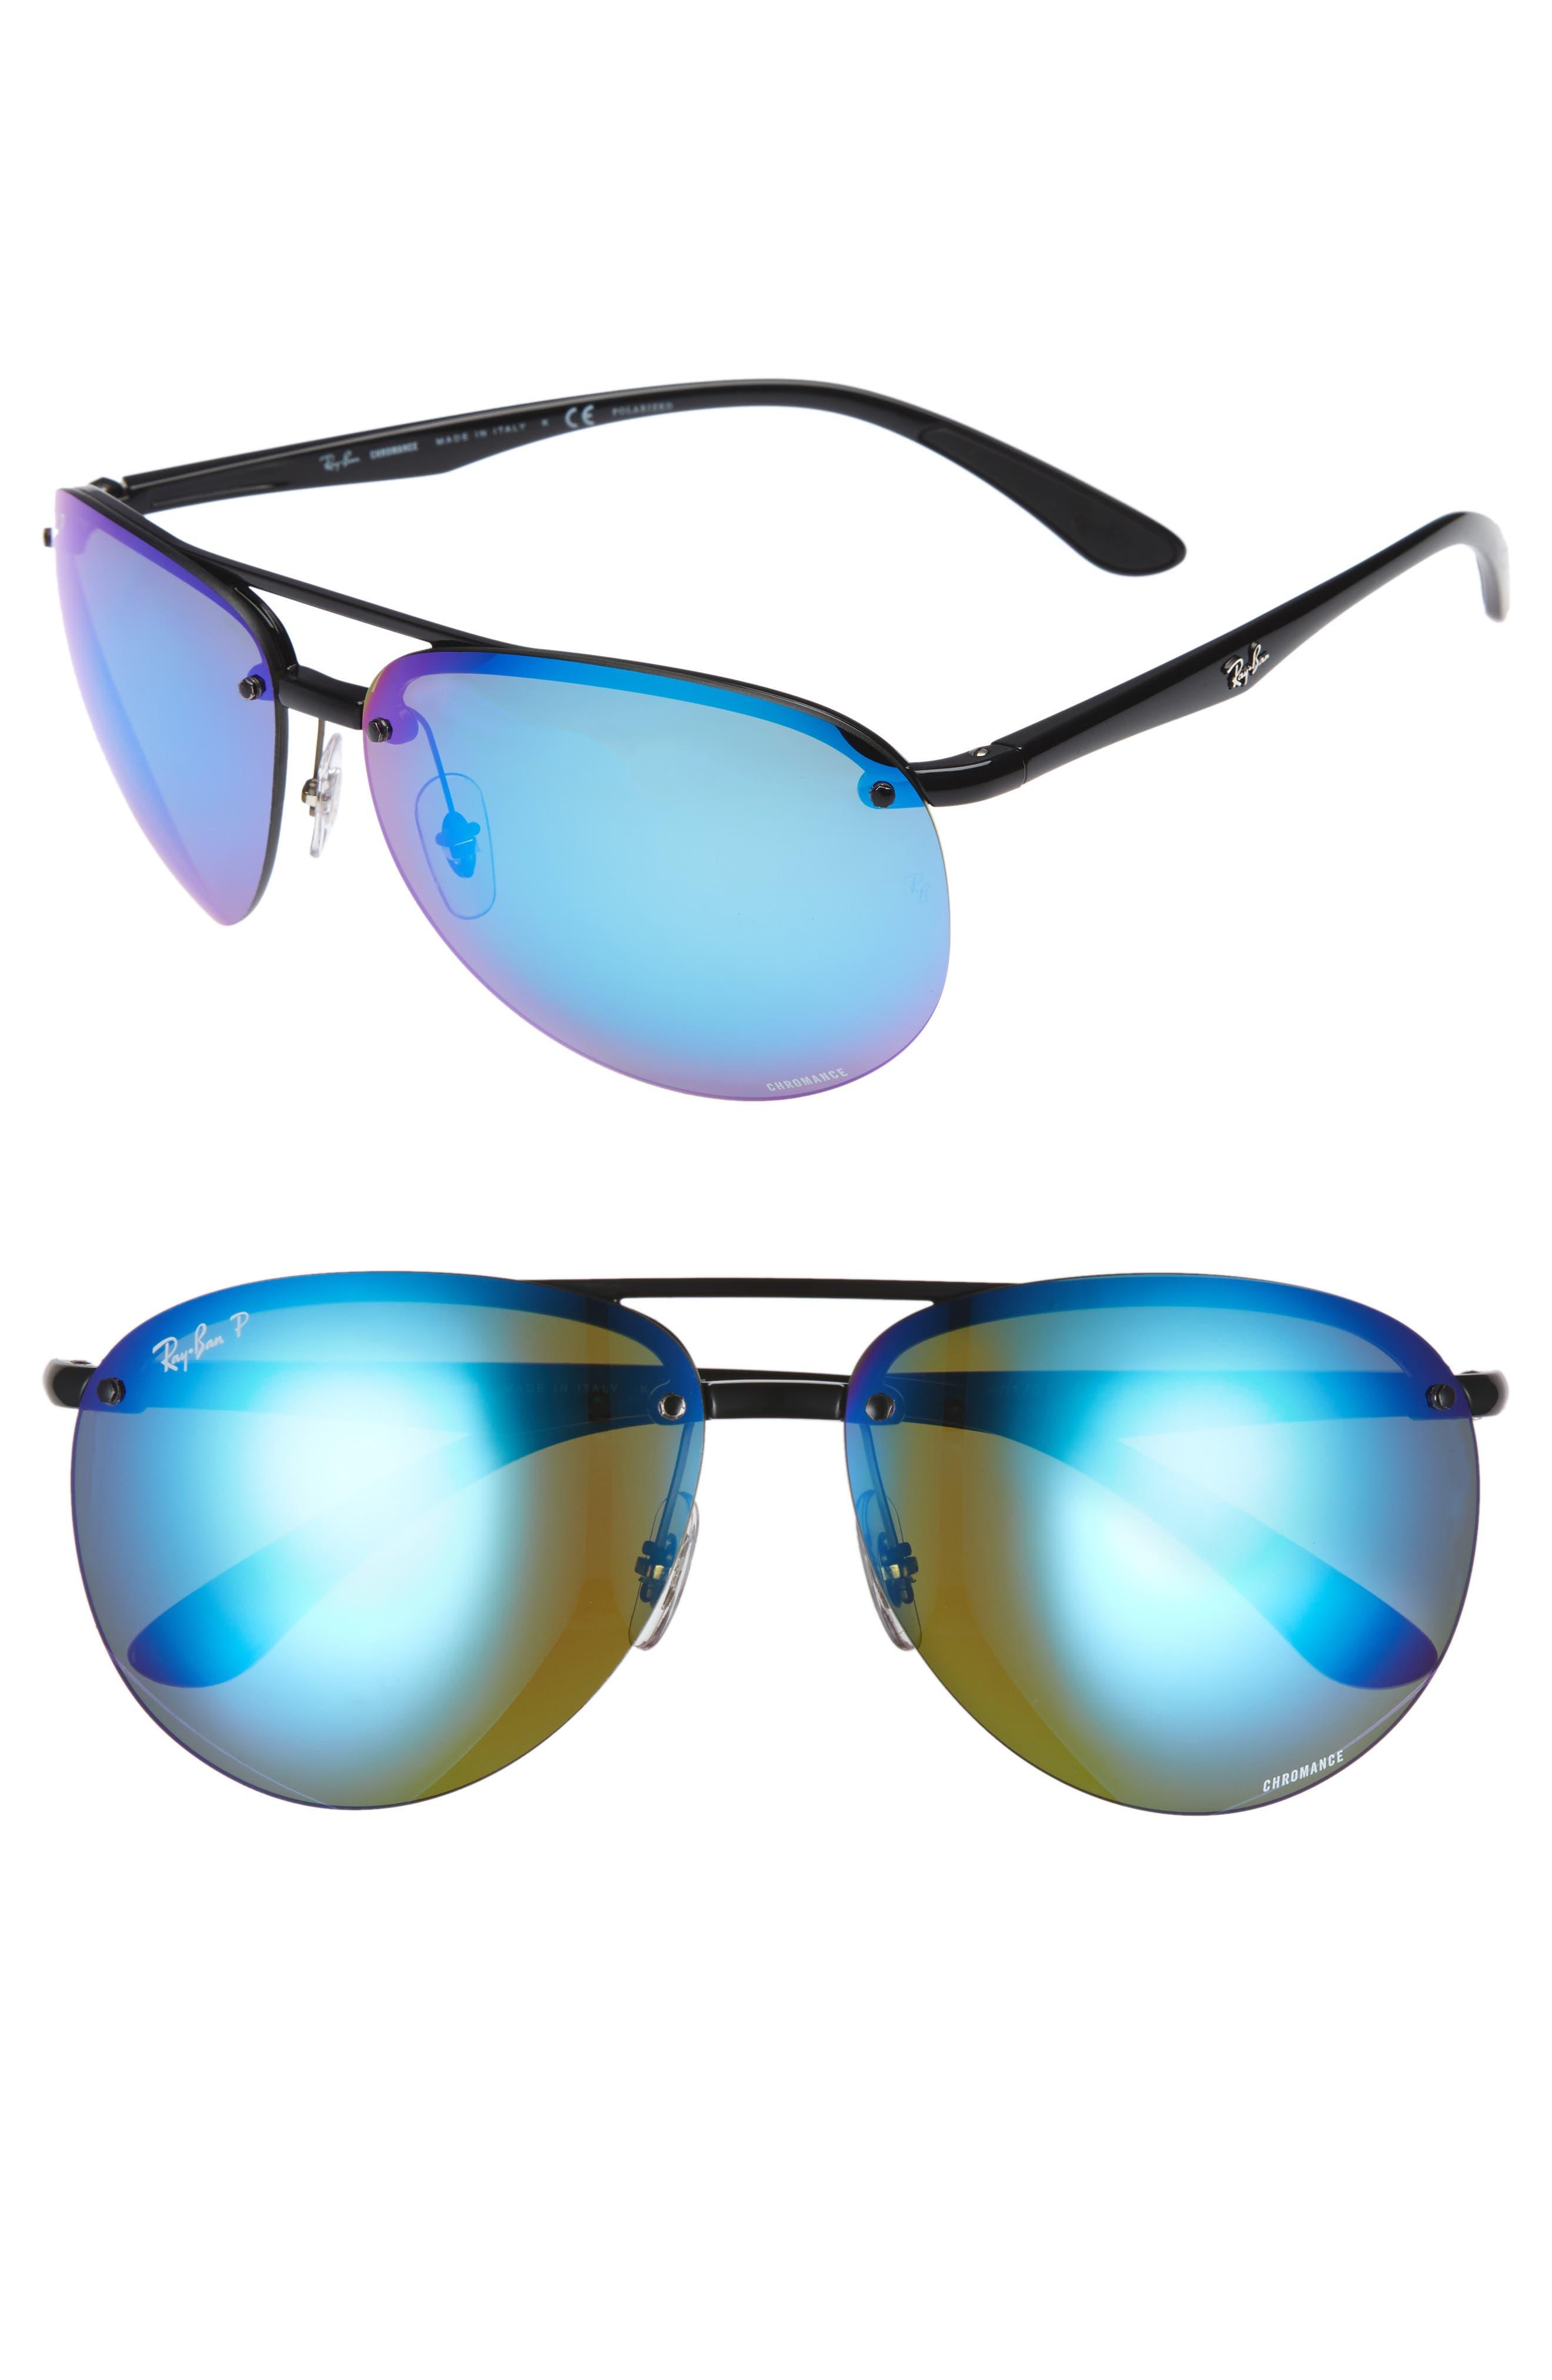 64mm Oversized Polarized Mirrored Rimless Aviator Sunglasses,                             Main thumbnail 1, color,                             001